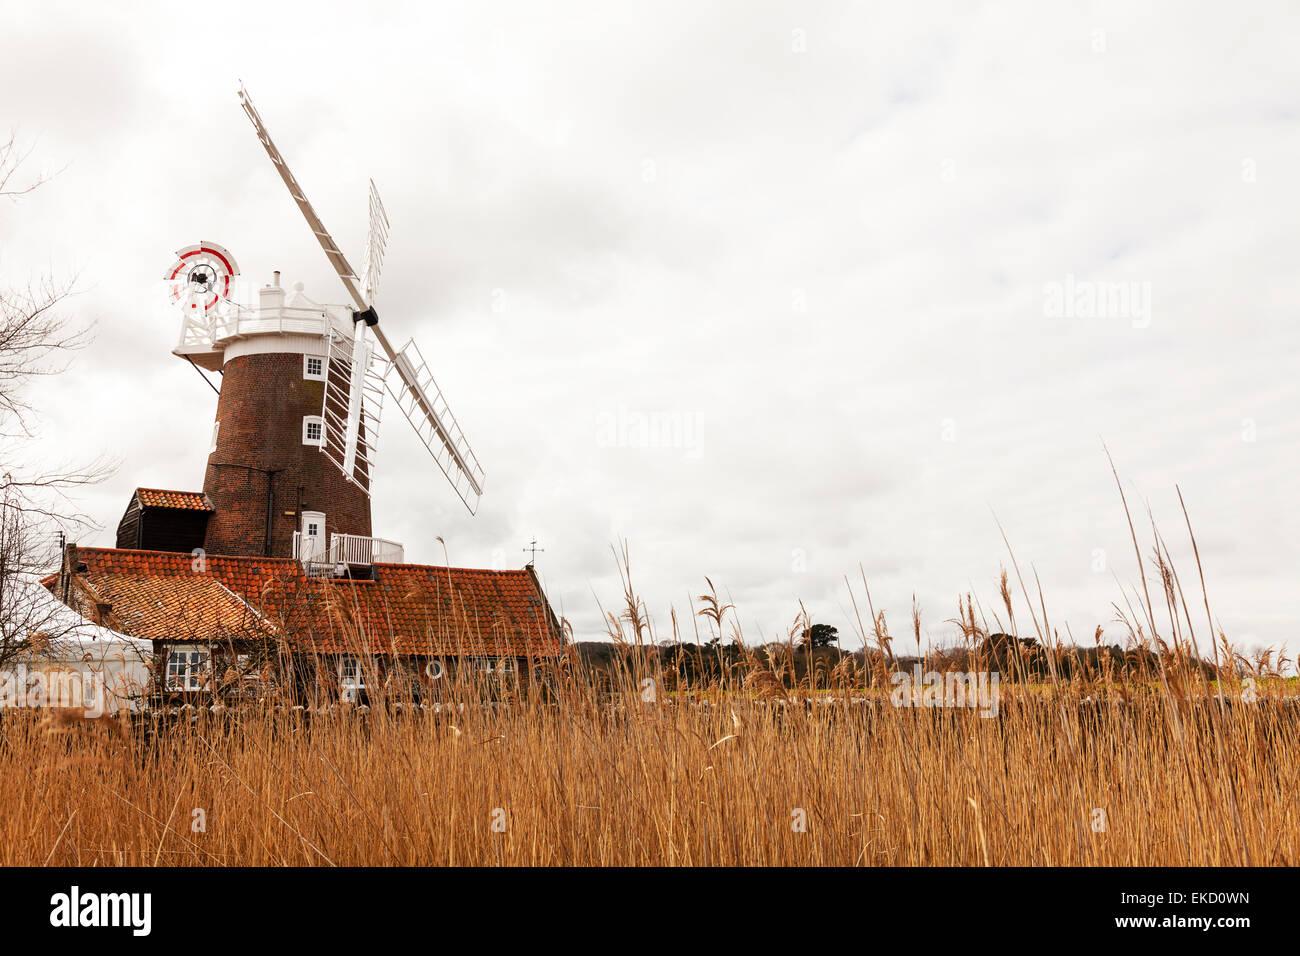 Cley nächstes Meer Windmühle Reed Sümpfe Sumpf Sumpf Land Norfolk UK dramatische Turm Mühle Stockbild